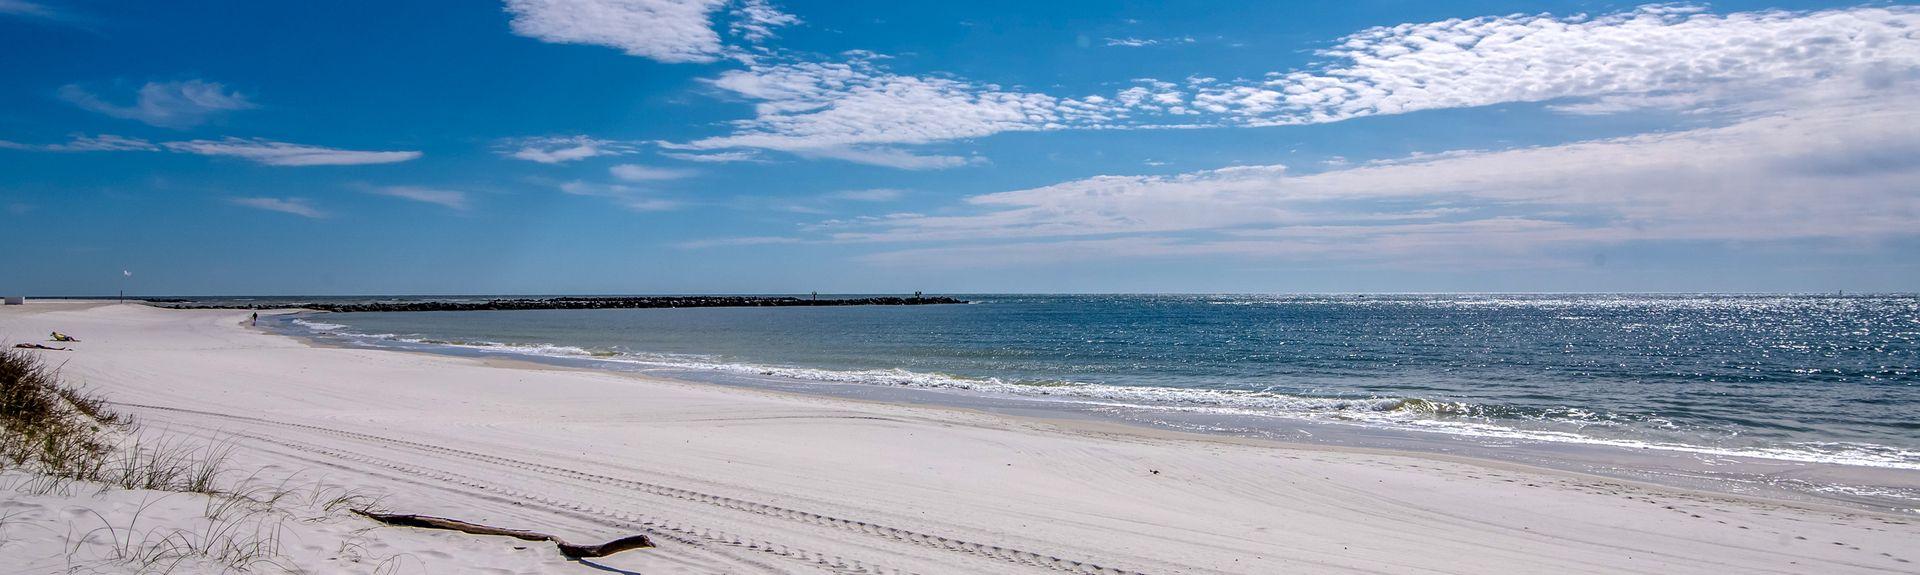 Phoenix East II, Orange Beach, AL, USA